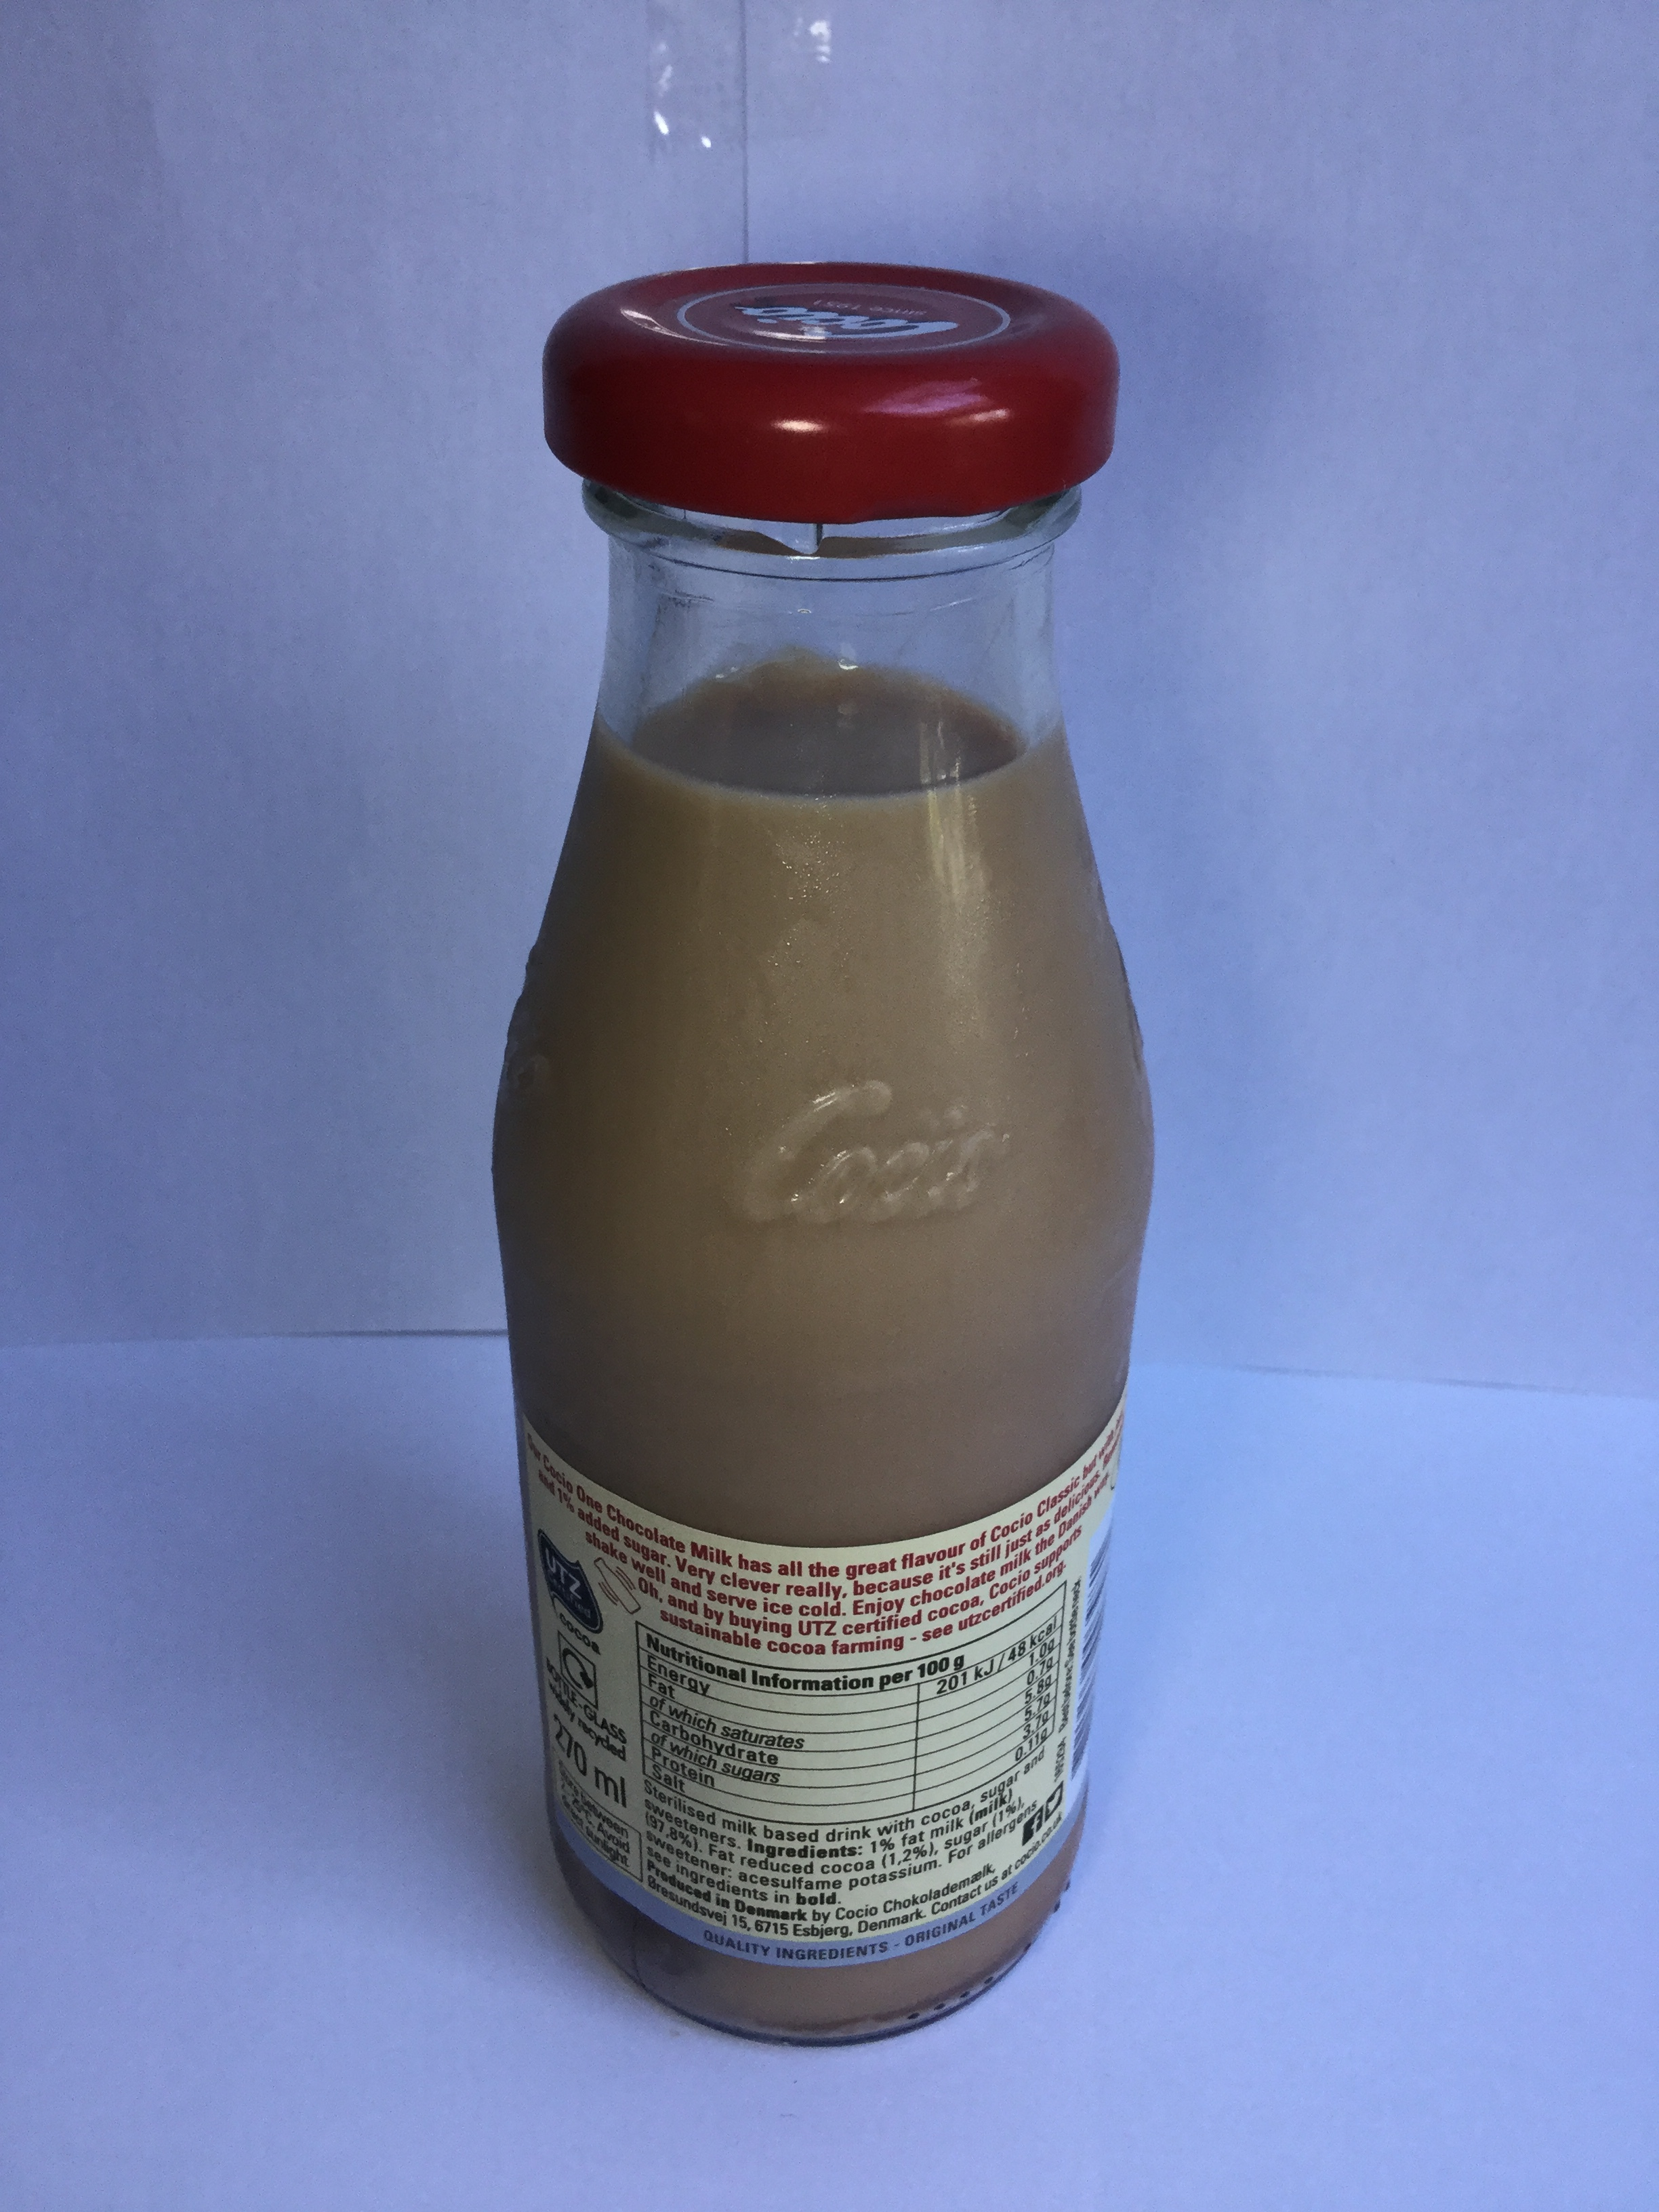 Cocio One Chocolate Milk Side 1